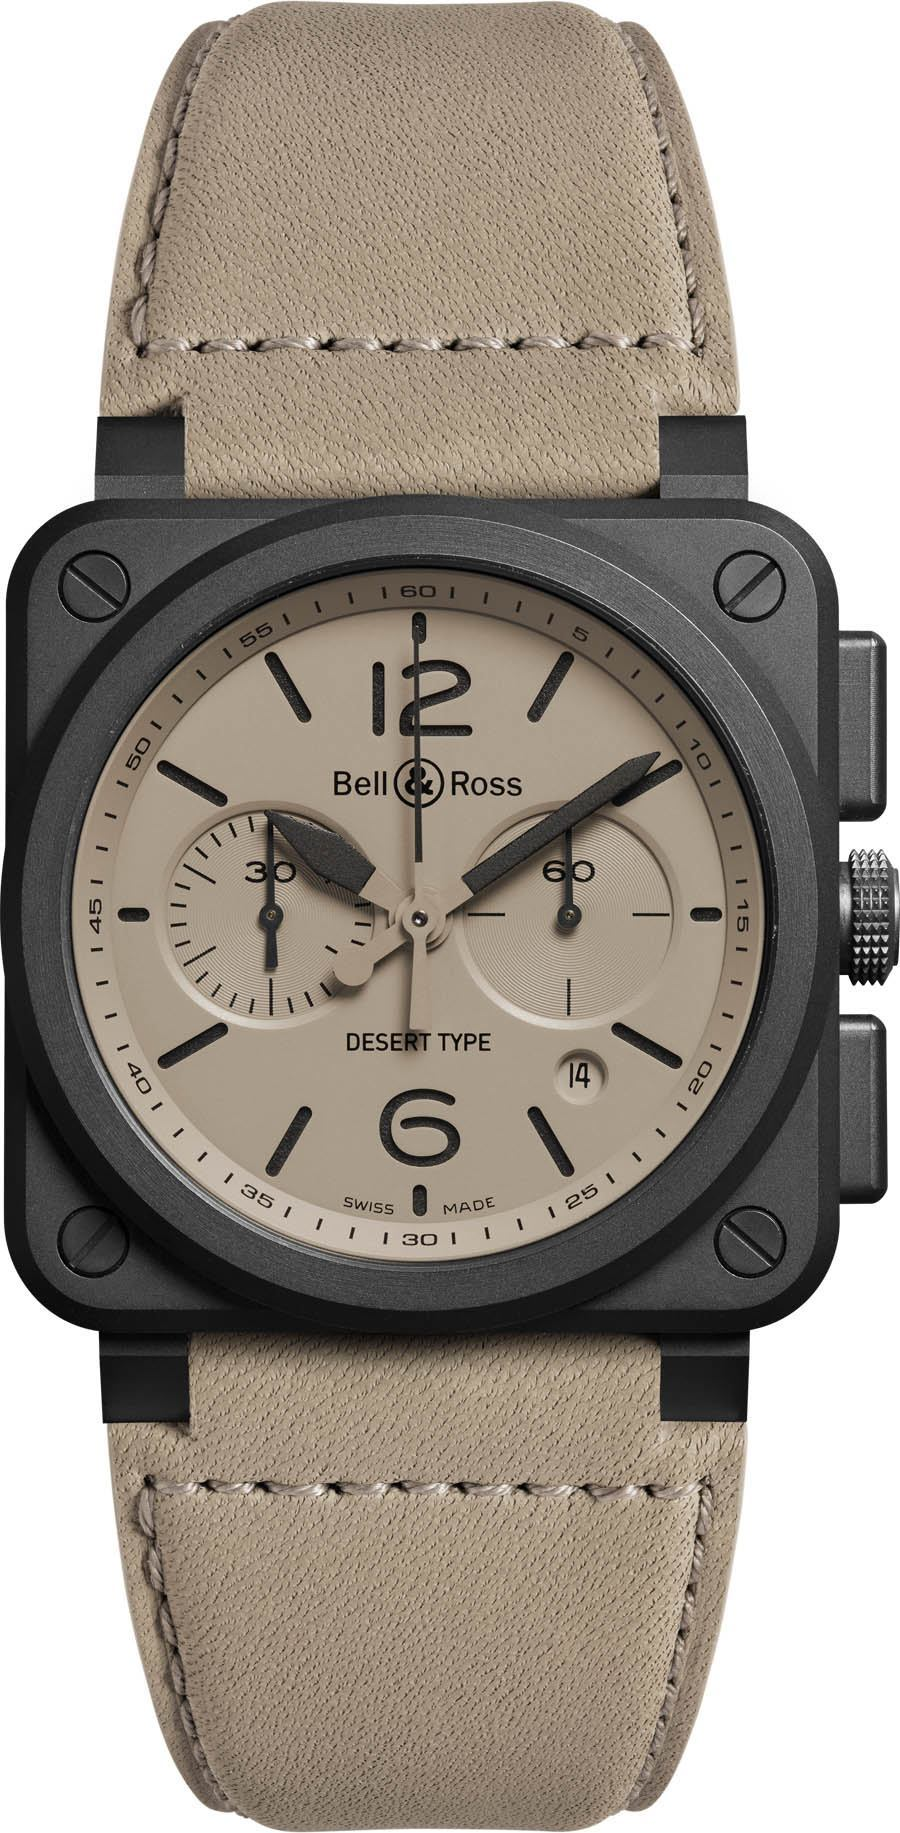 Bell & Ross: Bicompax-Chronograph BR03-94 Desert Type